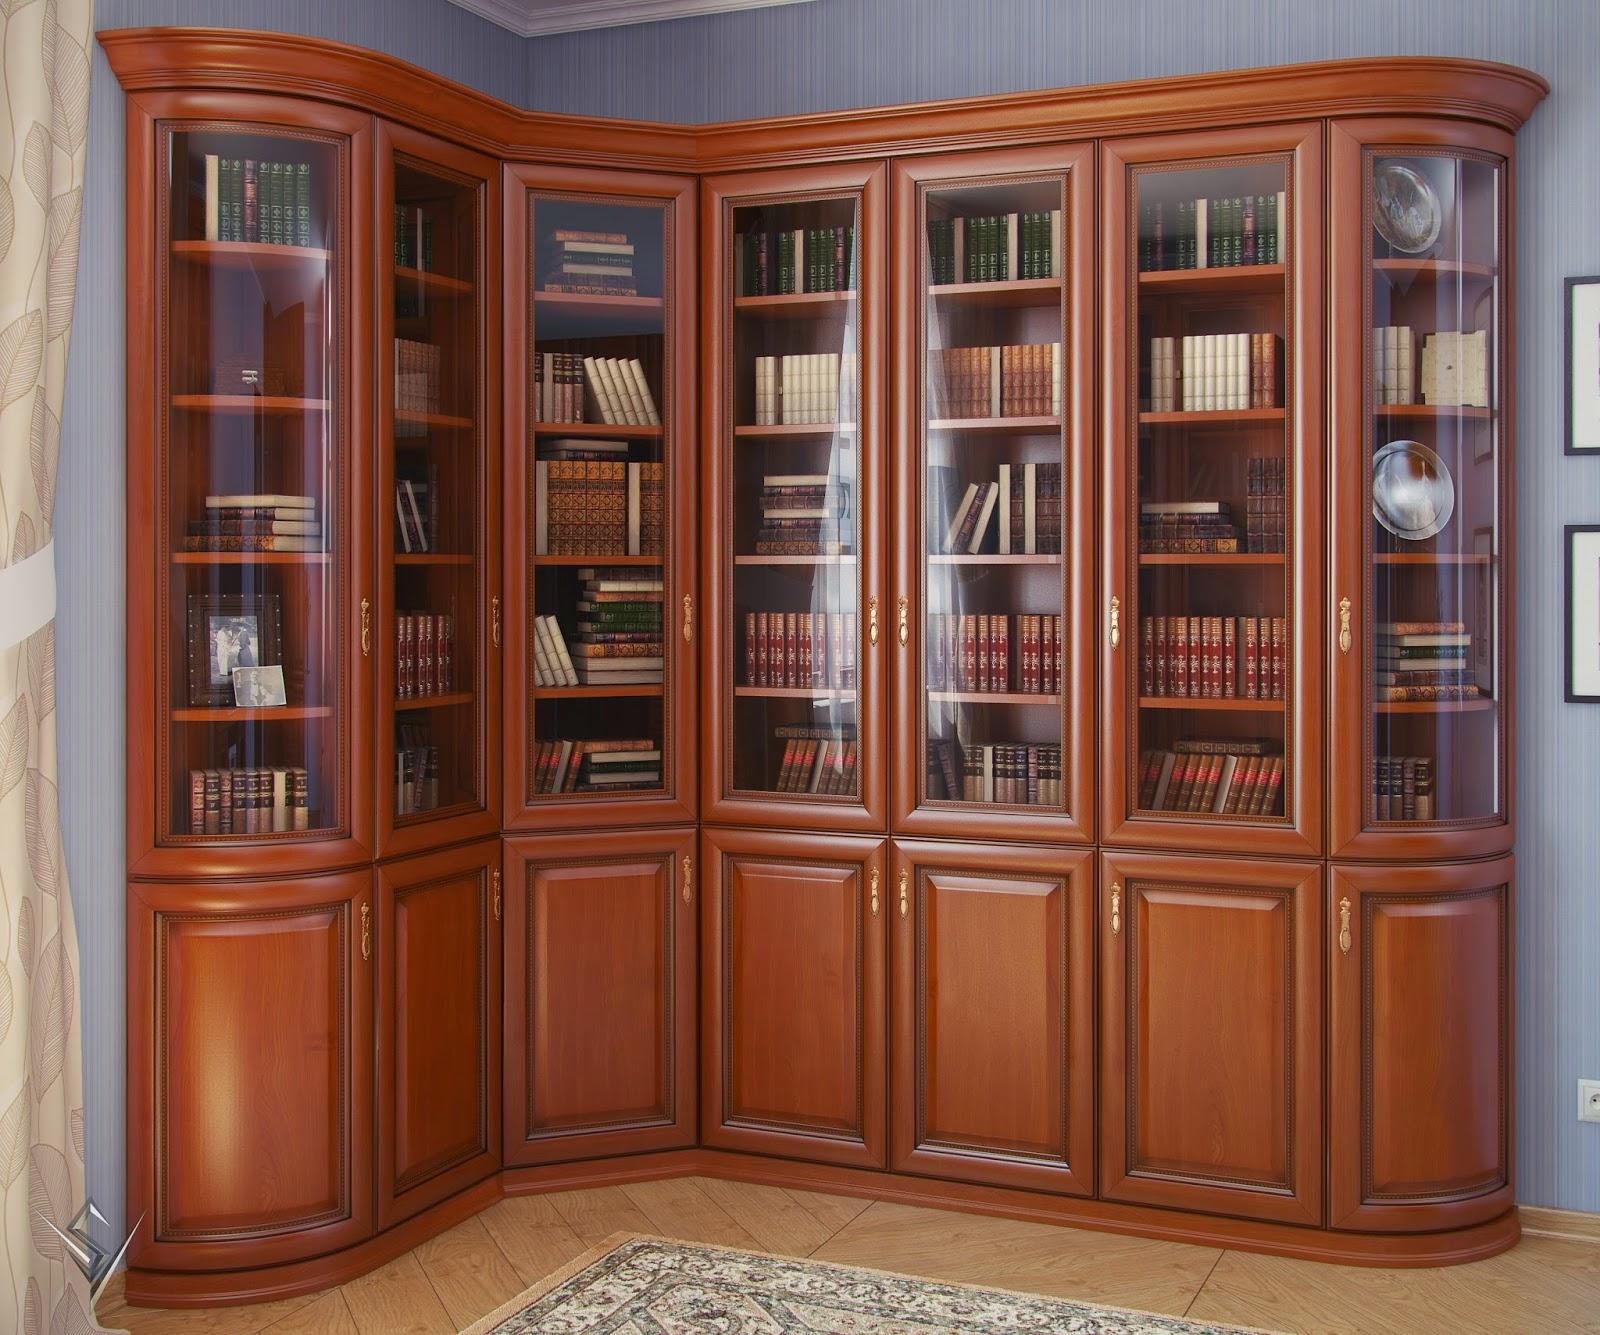 3d модели: шкафы - комбат \\ угловой шкаф для книг.